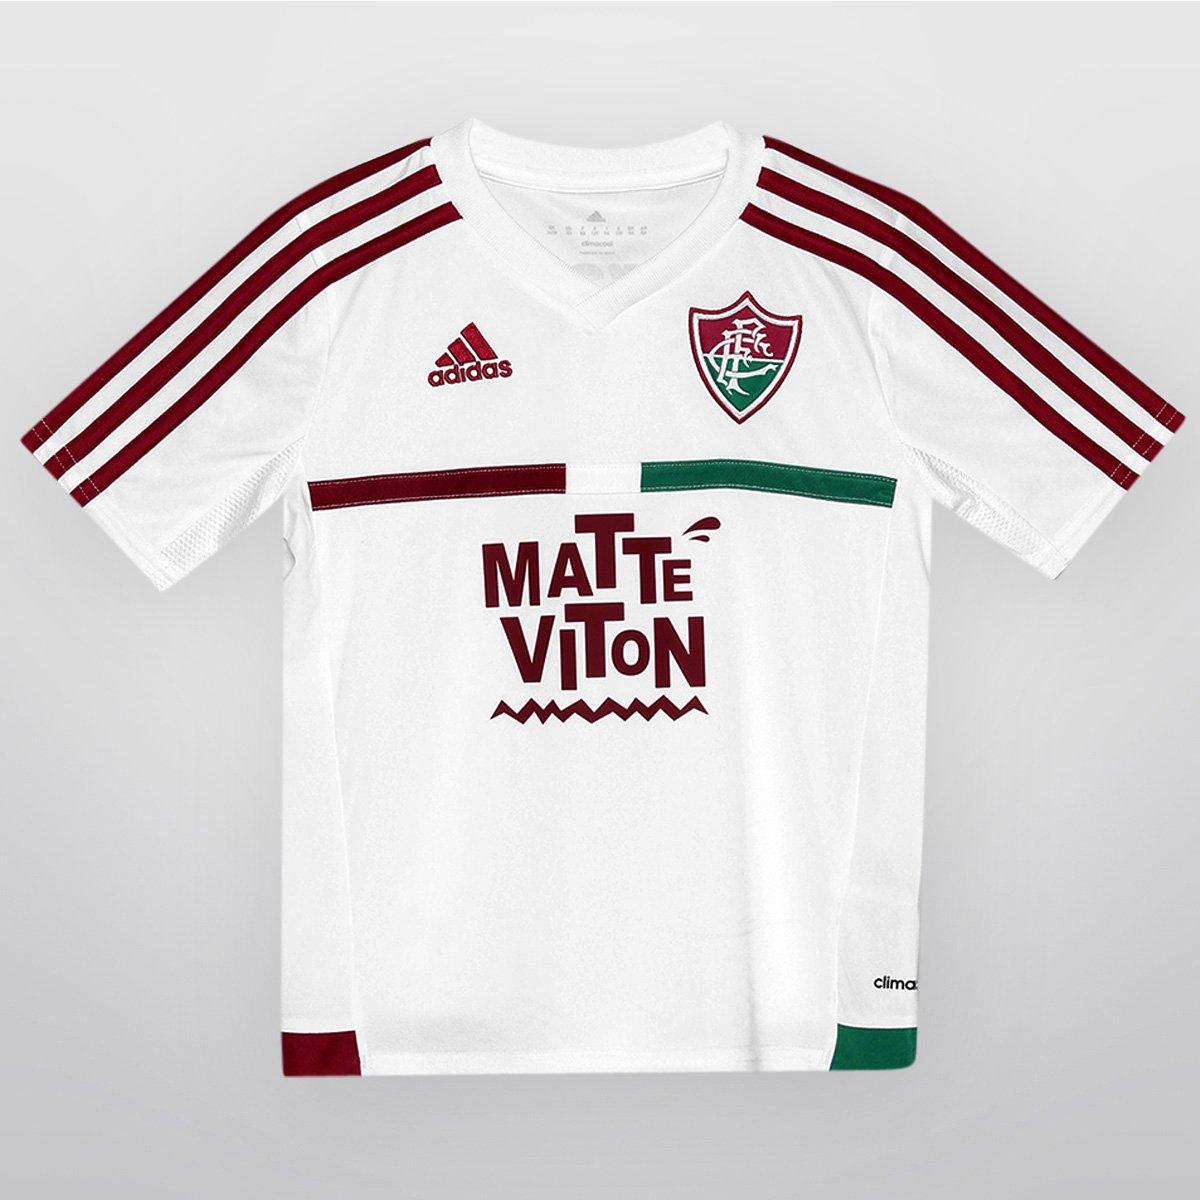 8e5ddf45405d8 Camisa Adidas Fluminense II 2015 s nº Infantil - Compre Agora